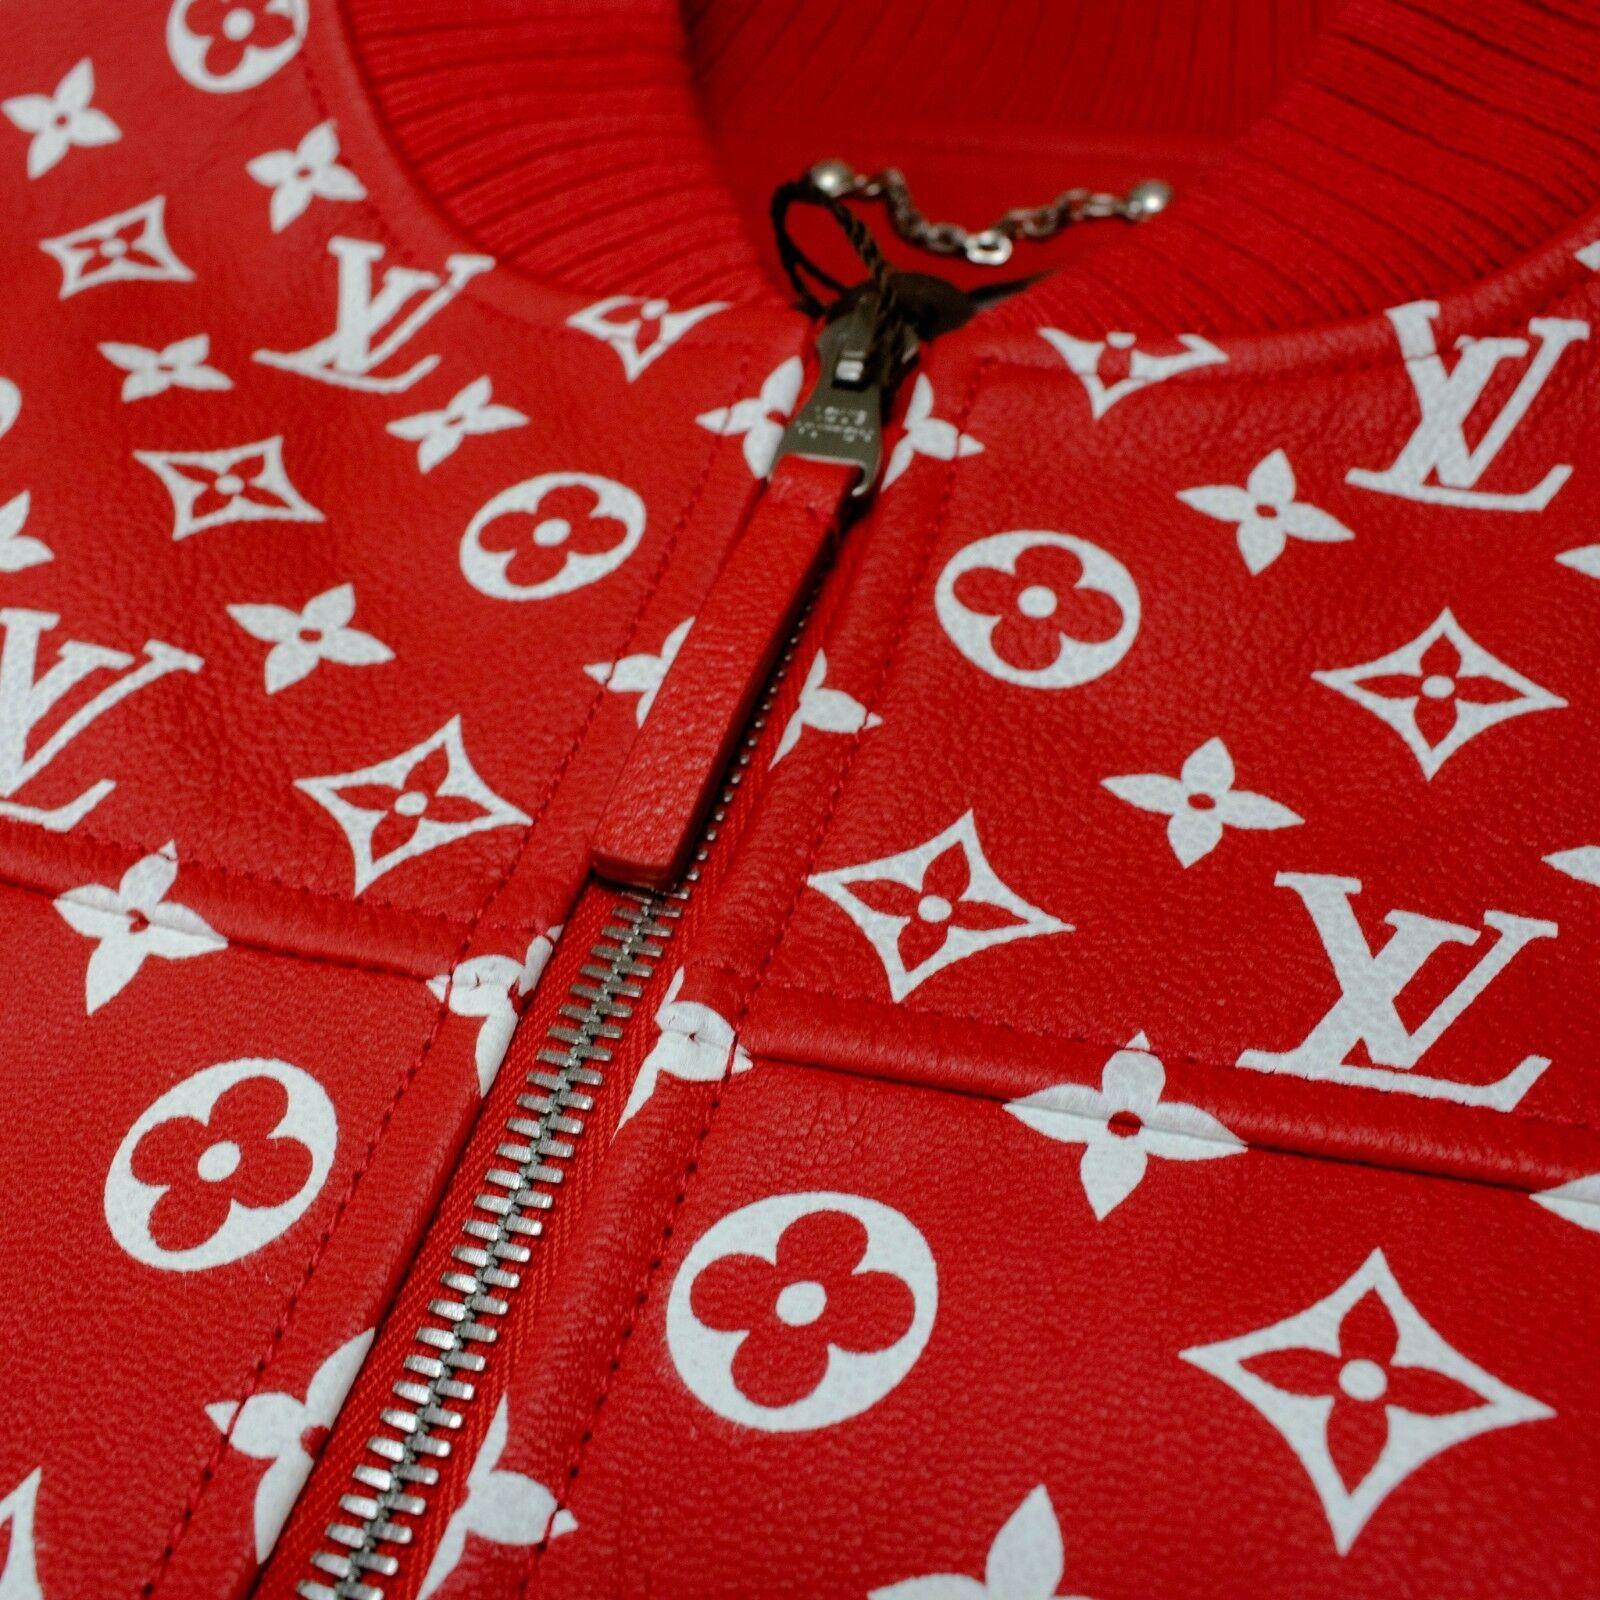 Supreme x Louis Vuitton Leather Blouson Monogram Jacket